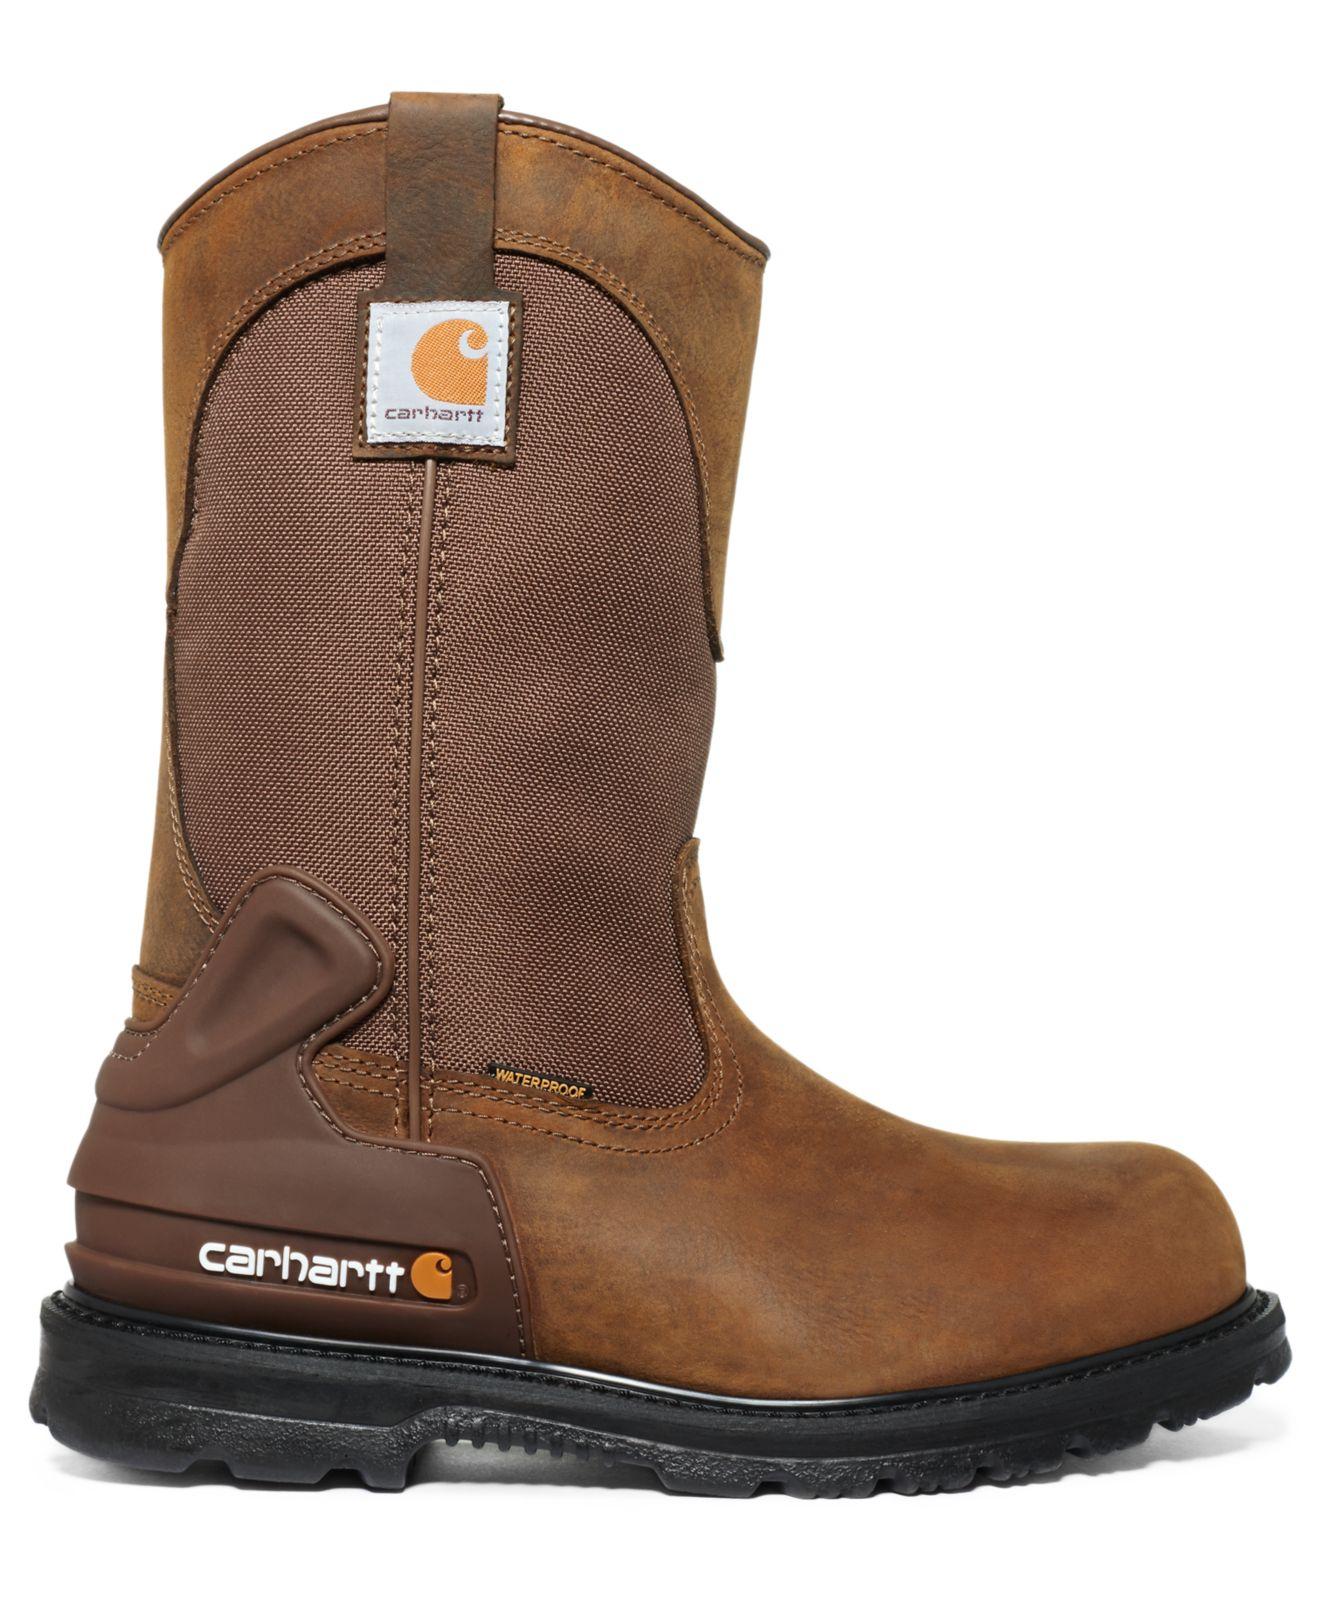 13b94176e78 Carhartt Brown 11-Inch Bison Waterproof Steel Toe Work Boots for men